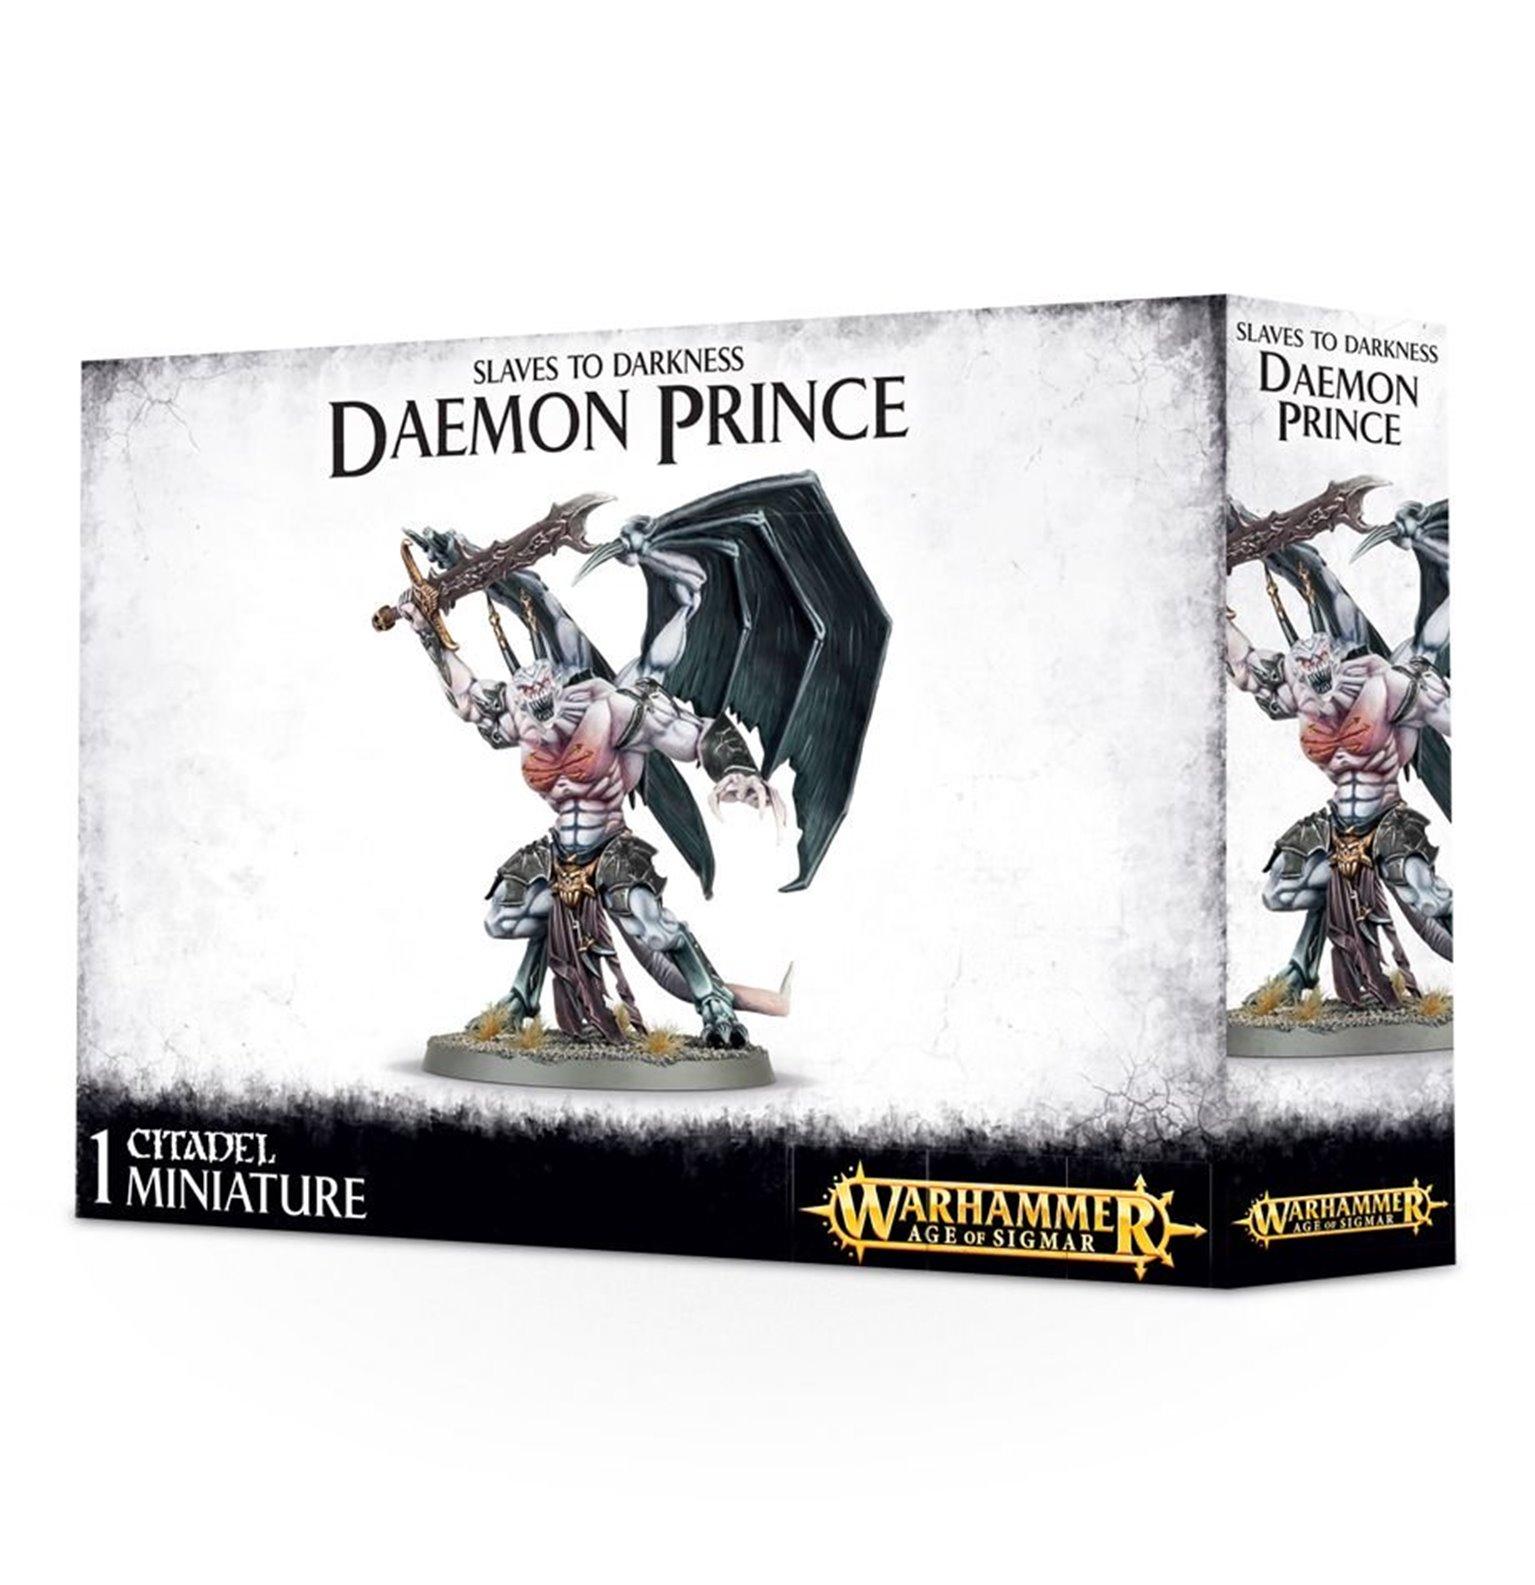 Warhammer Age of Sigmar Slaves to Darkness Daemon Prince